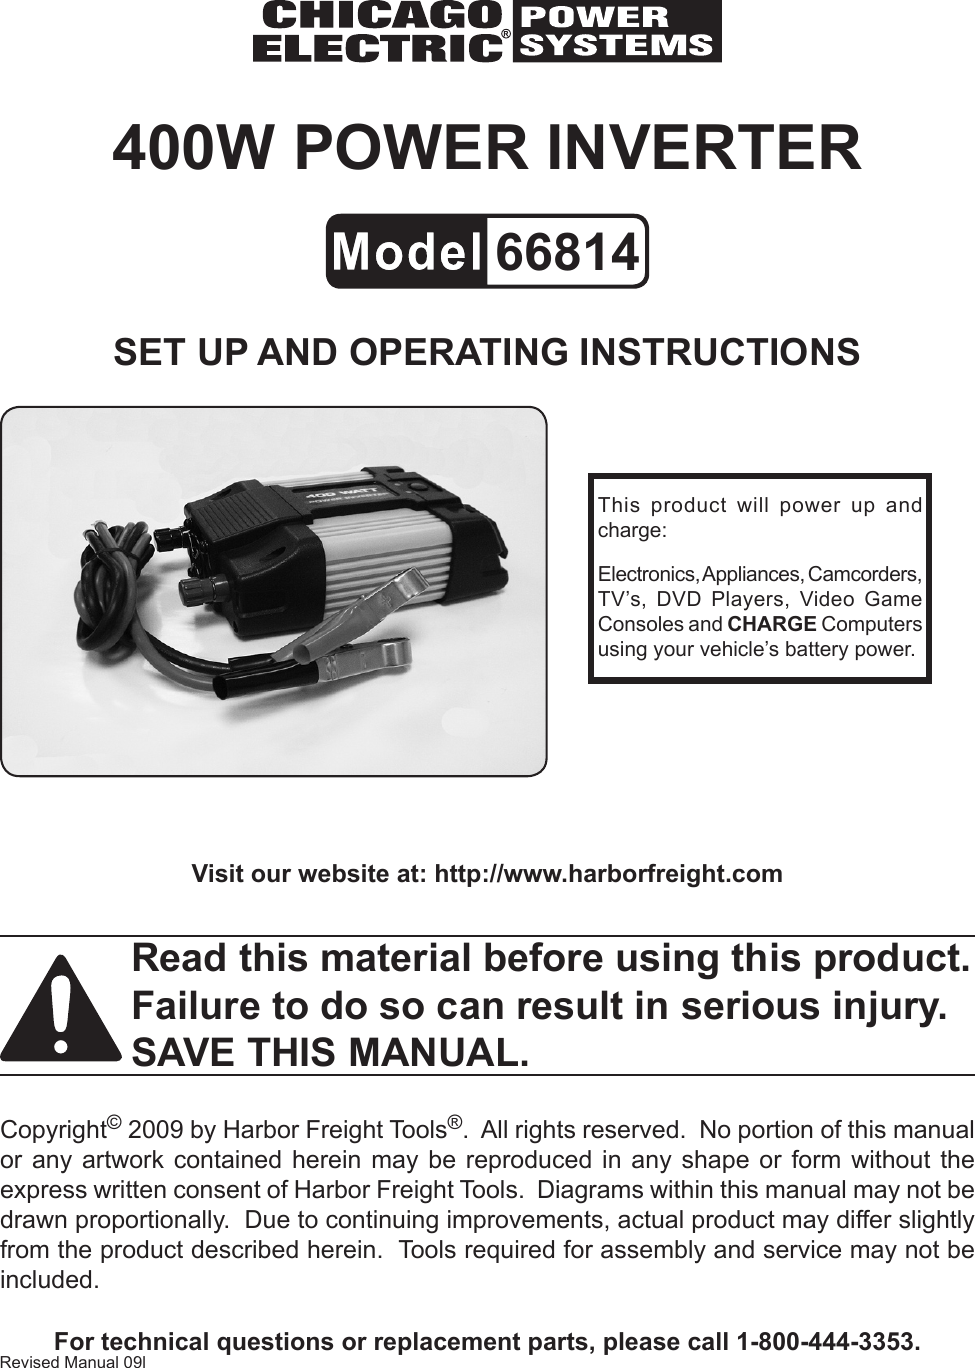 ls600 inverter user manual pdf